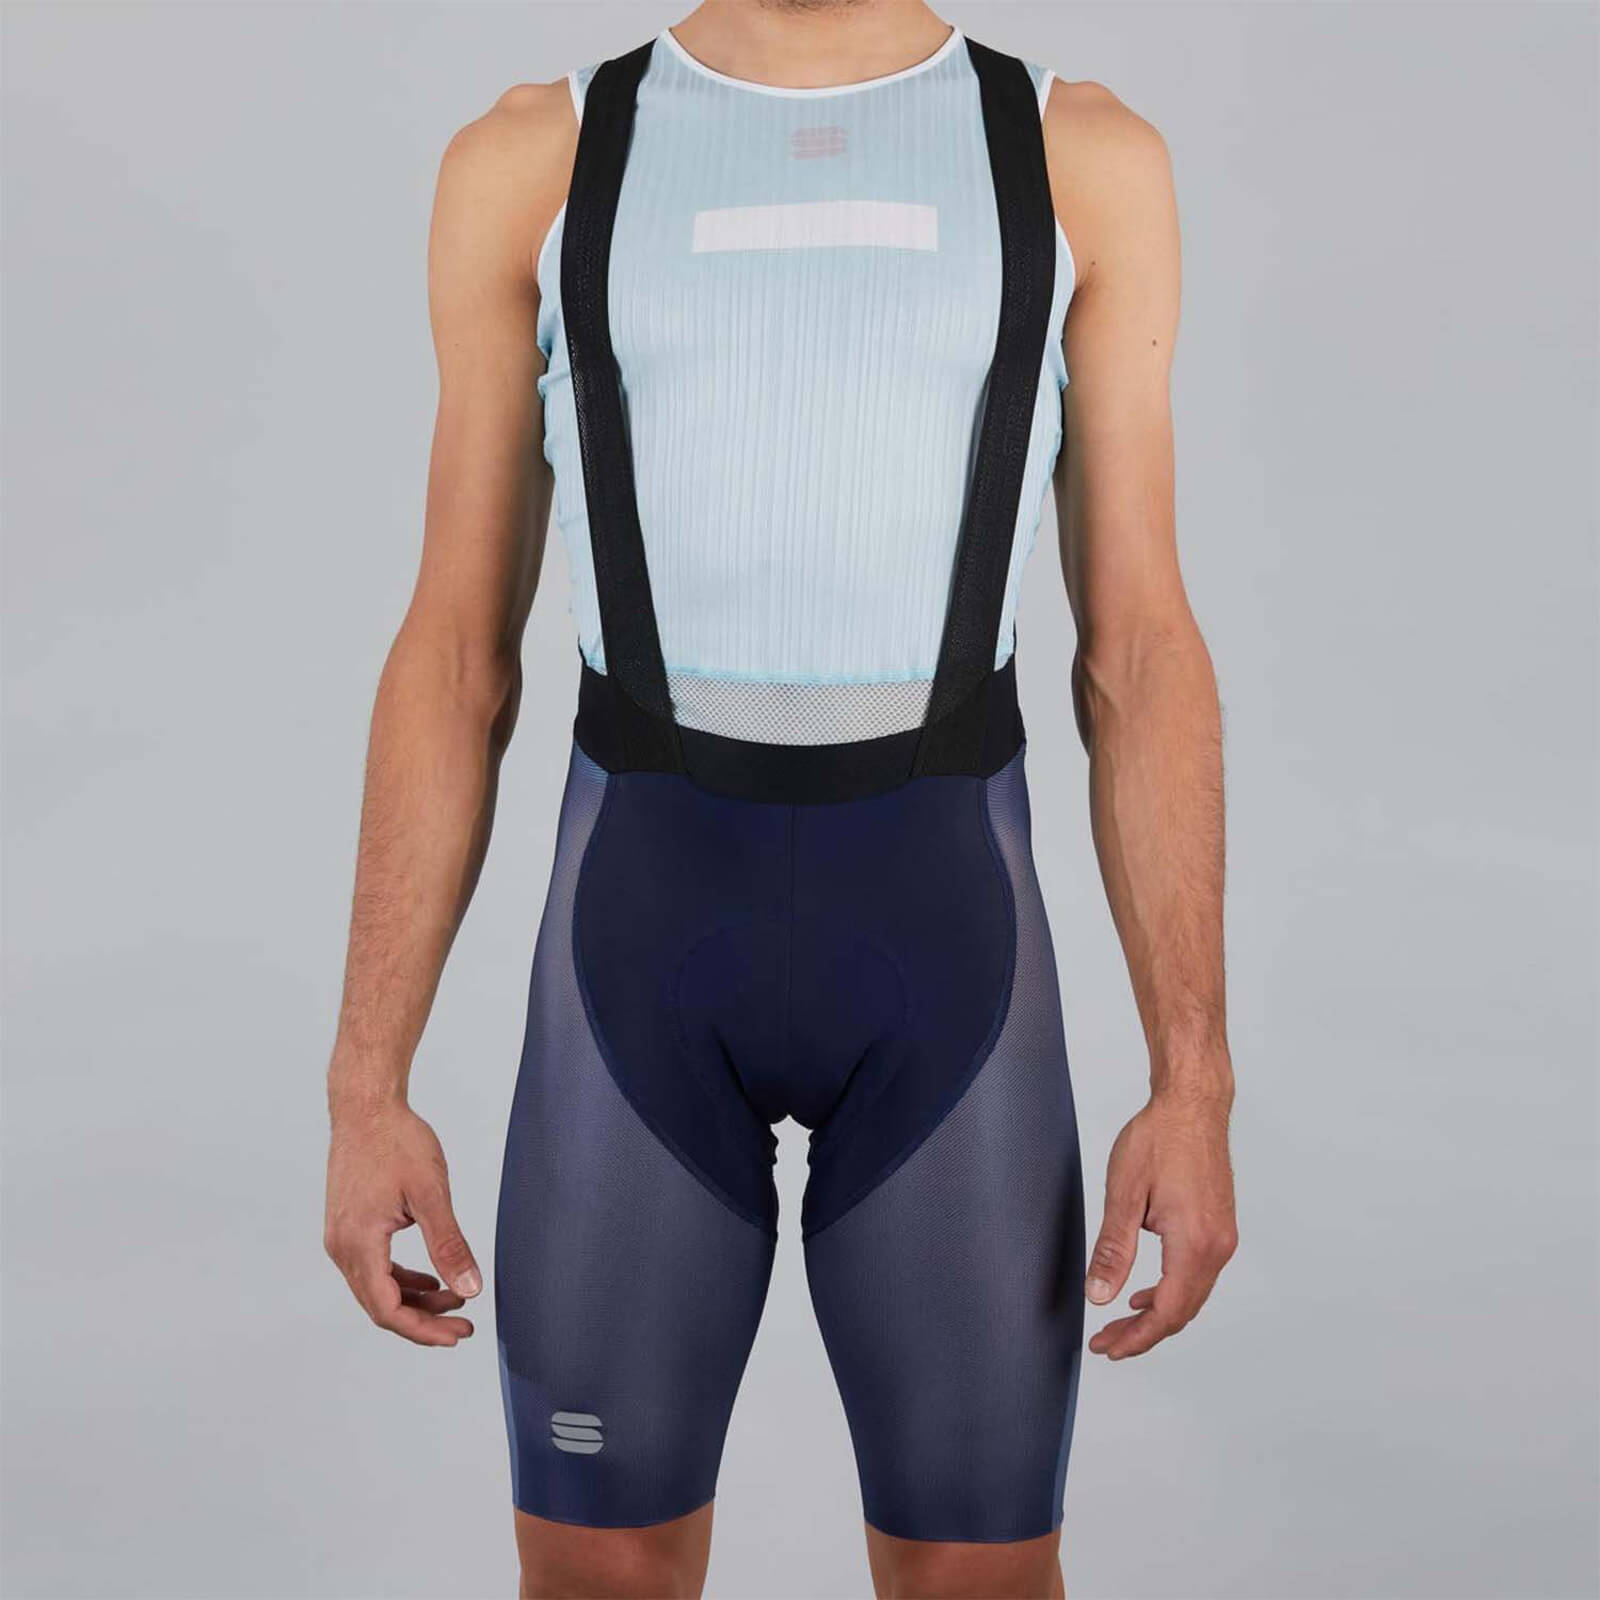 Sportful BodyFit Pro Air Bib Shorts - S - Blue/Blue Sea